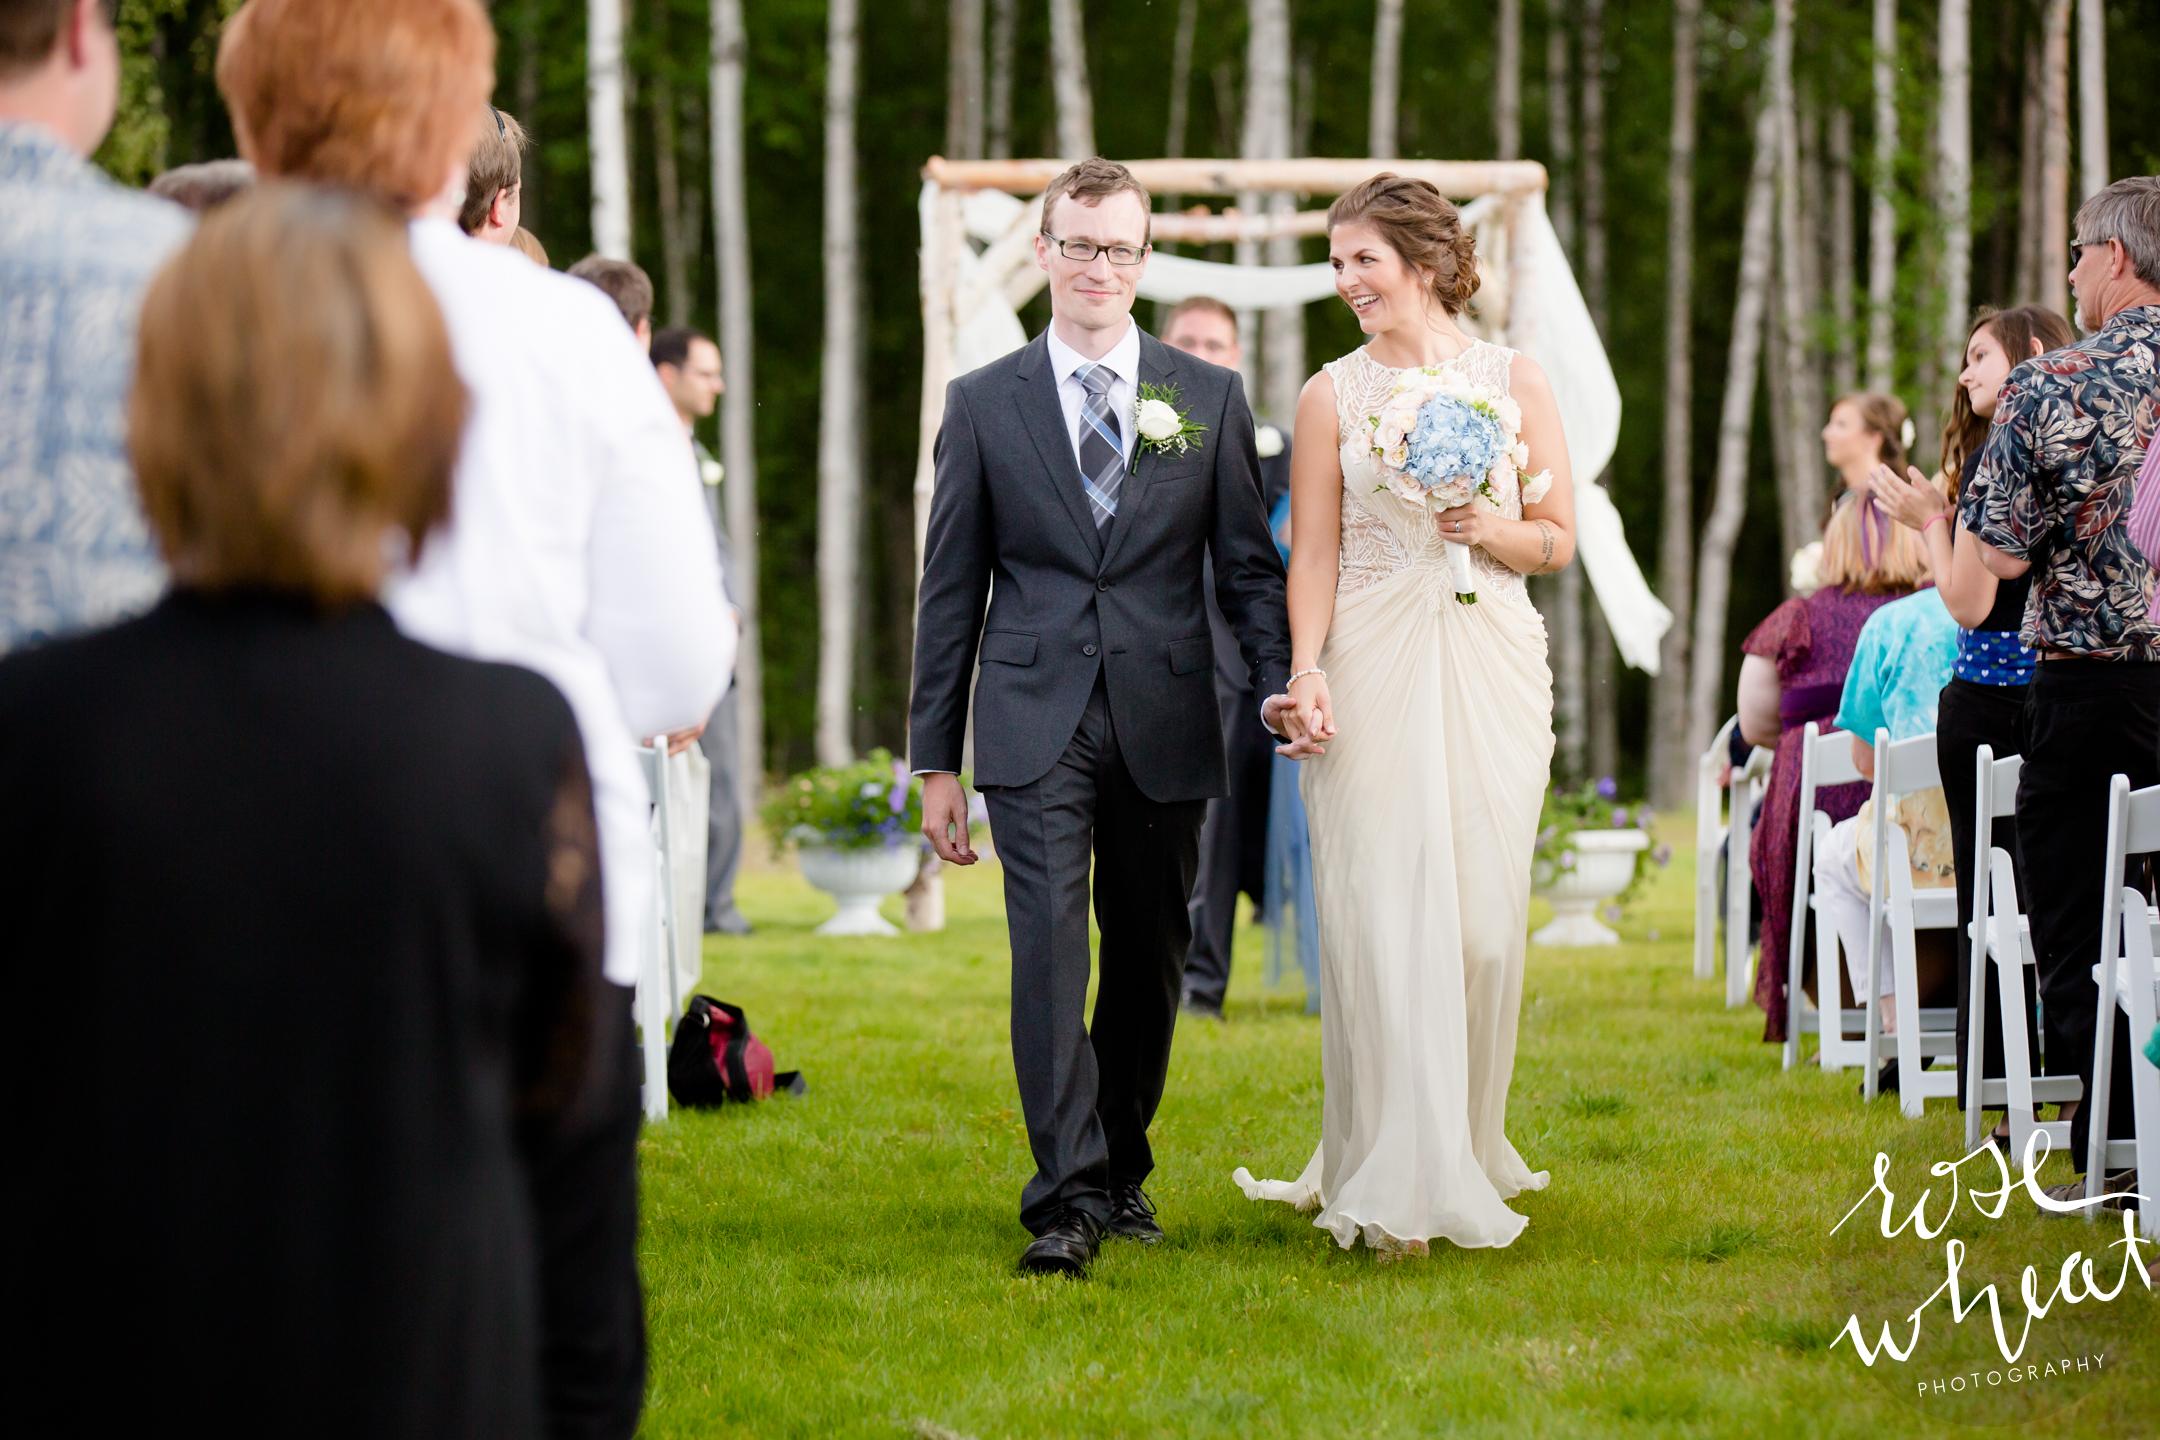 12. Birch_Hill_Fairbanks_Ak_Wedding_Rose_Wheat_Photogrpahy-1.jpg-17.jpg